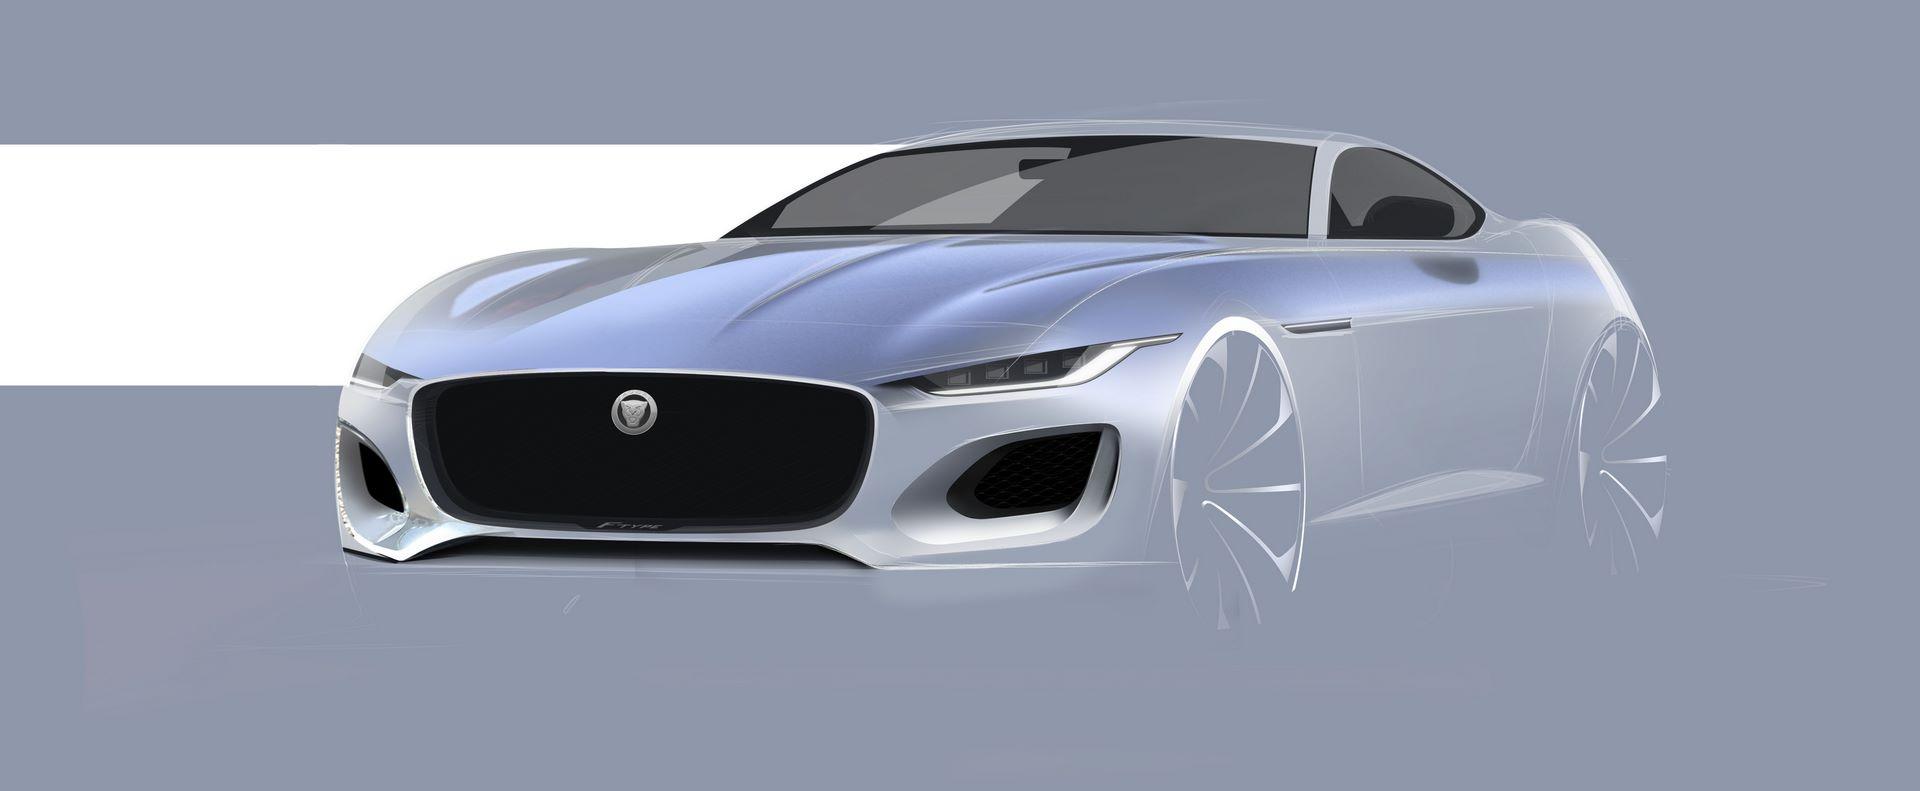 Jaguar-F-Type-facelift-2020-45